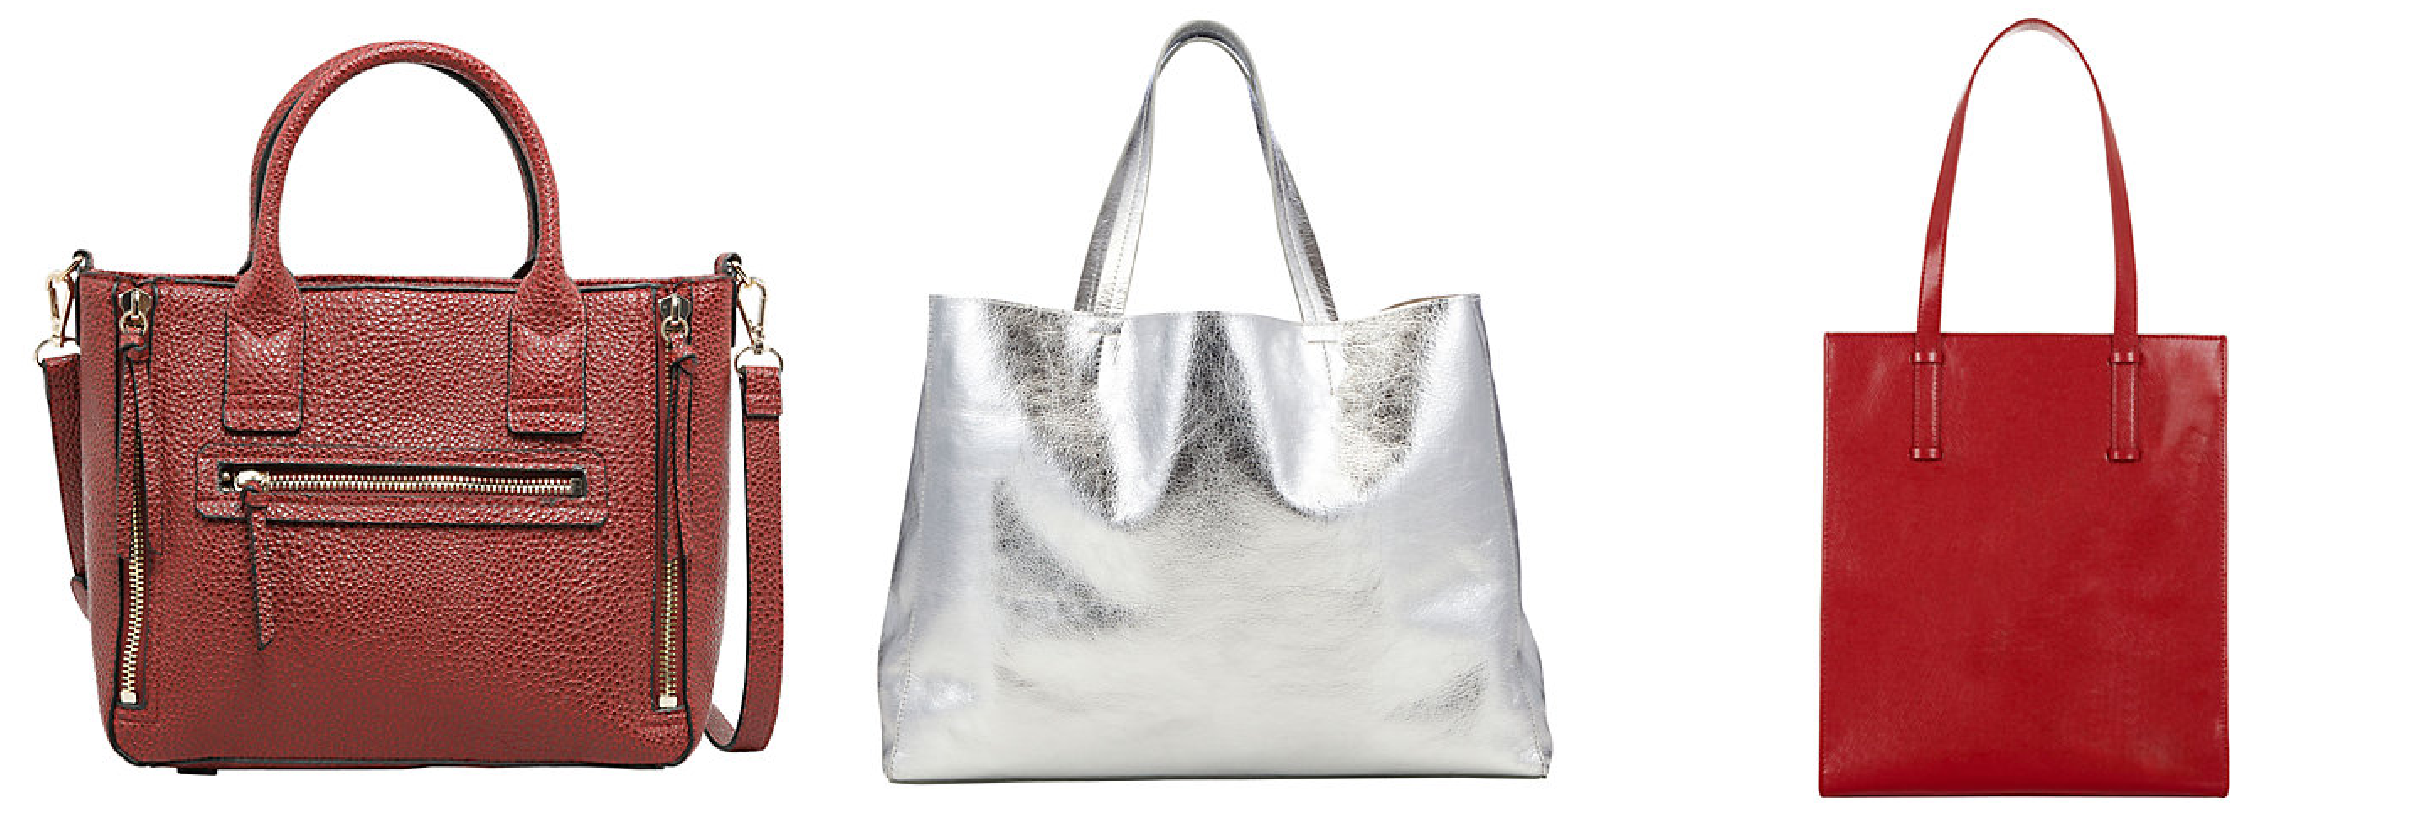 Top 15 Handbags under £100